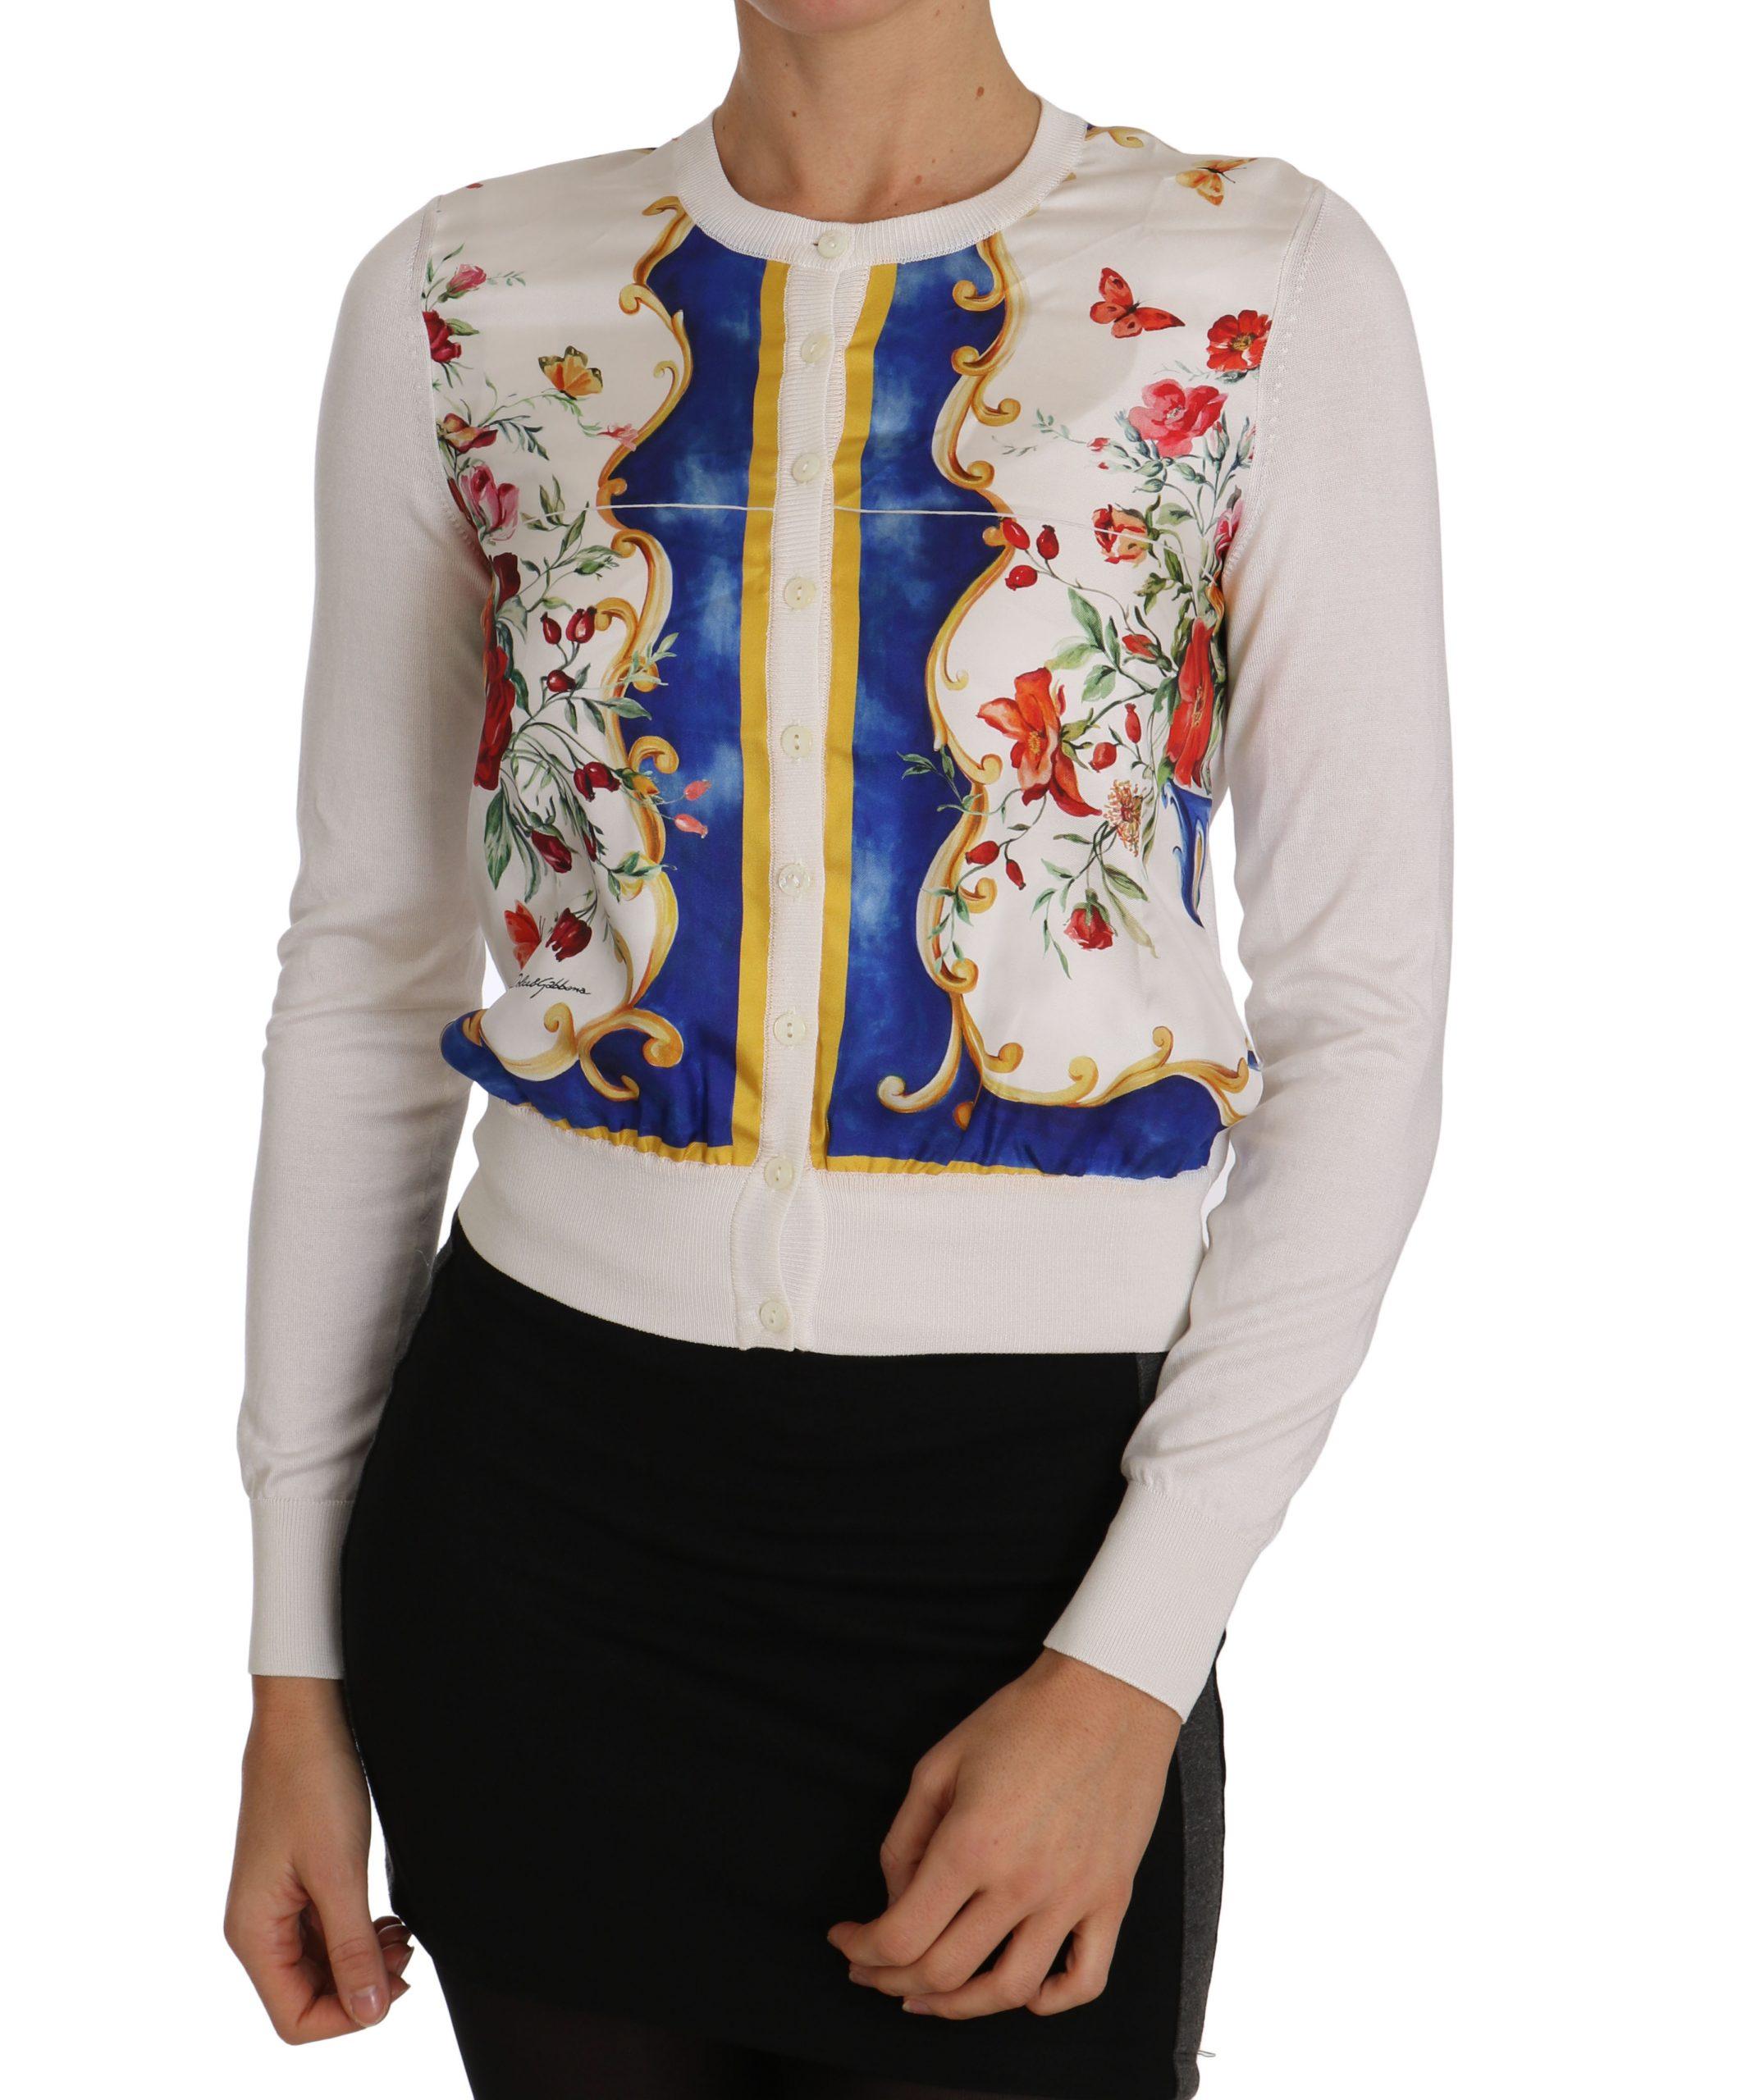 Dolce & Gabbana Women's Majolica Floral Silk Cardigan White TSH2280 - IT38|XS